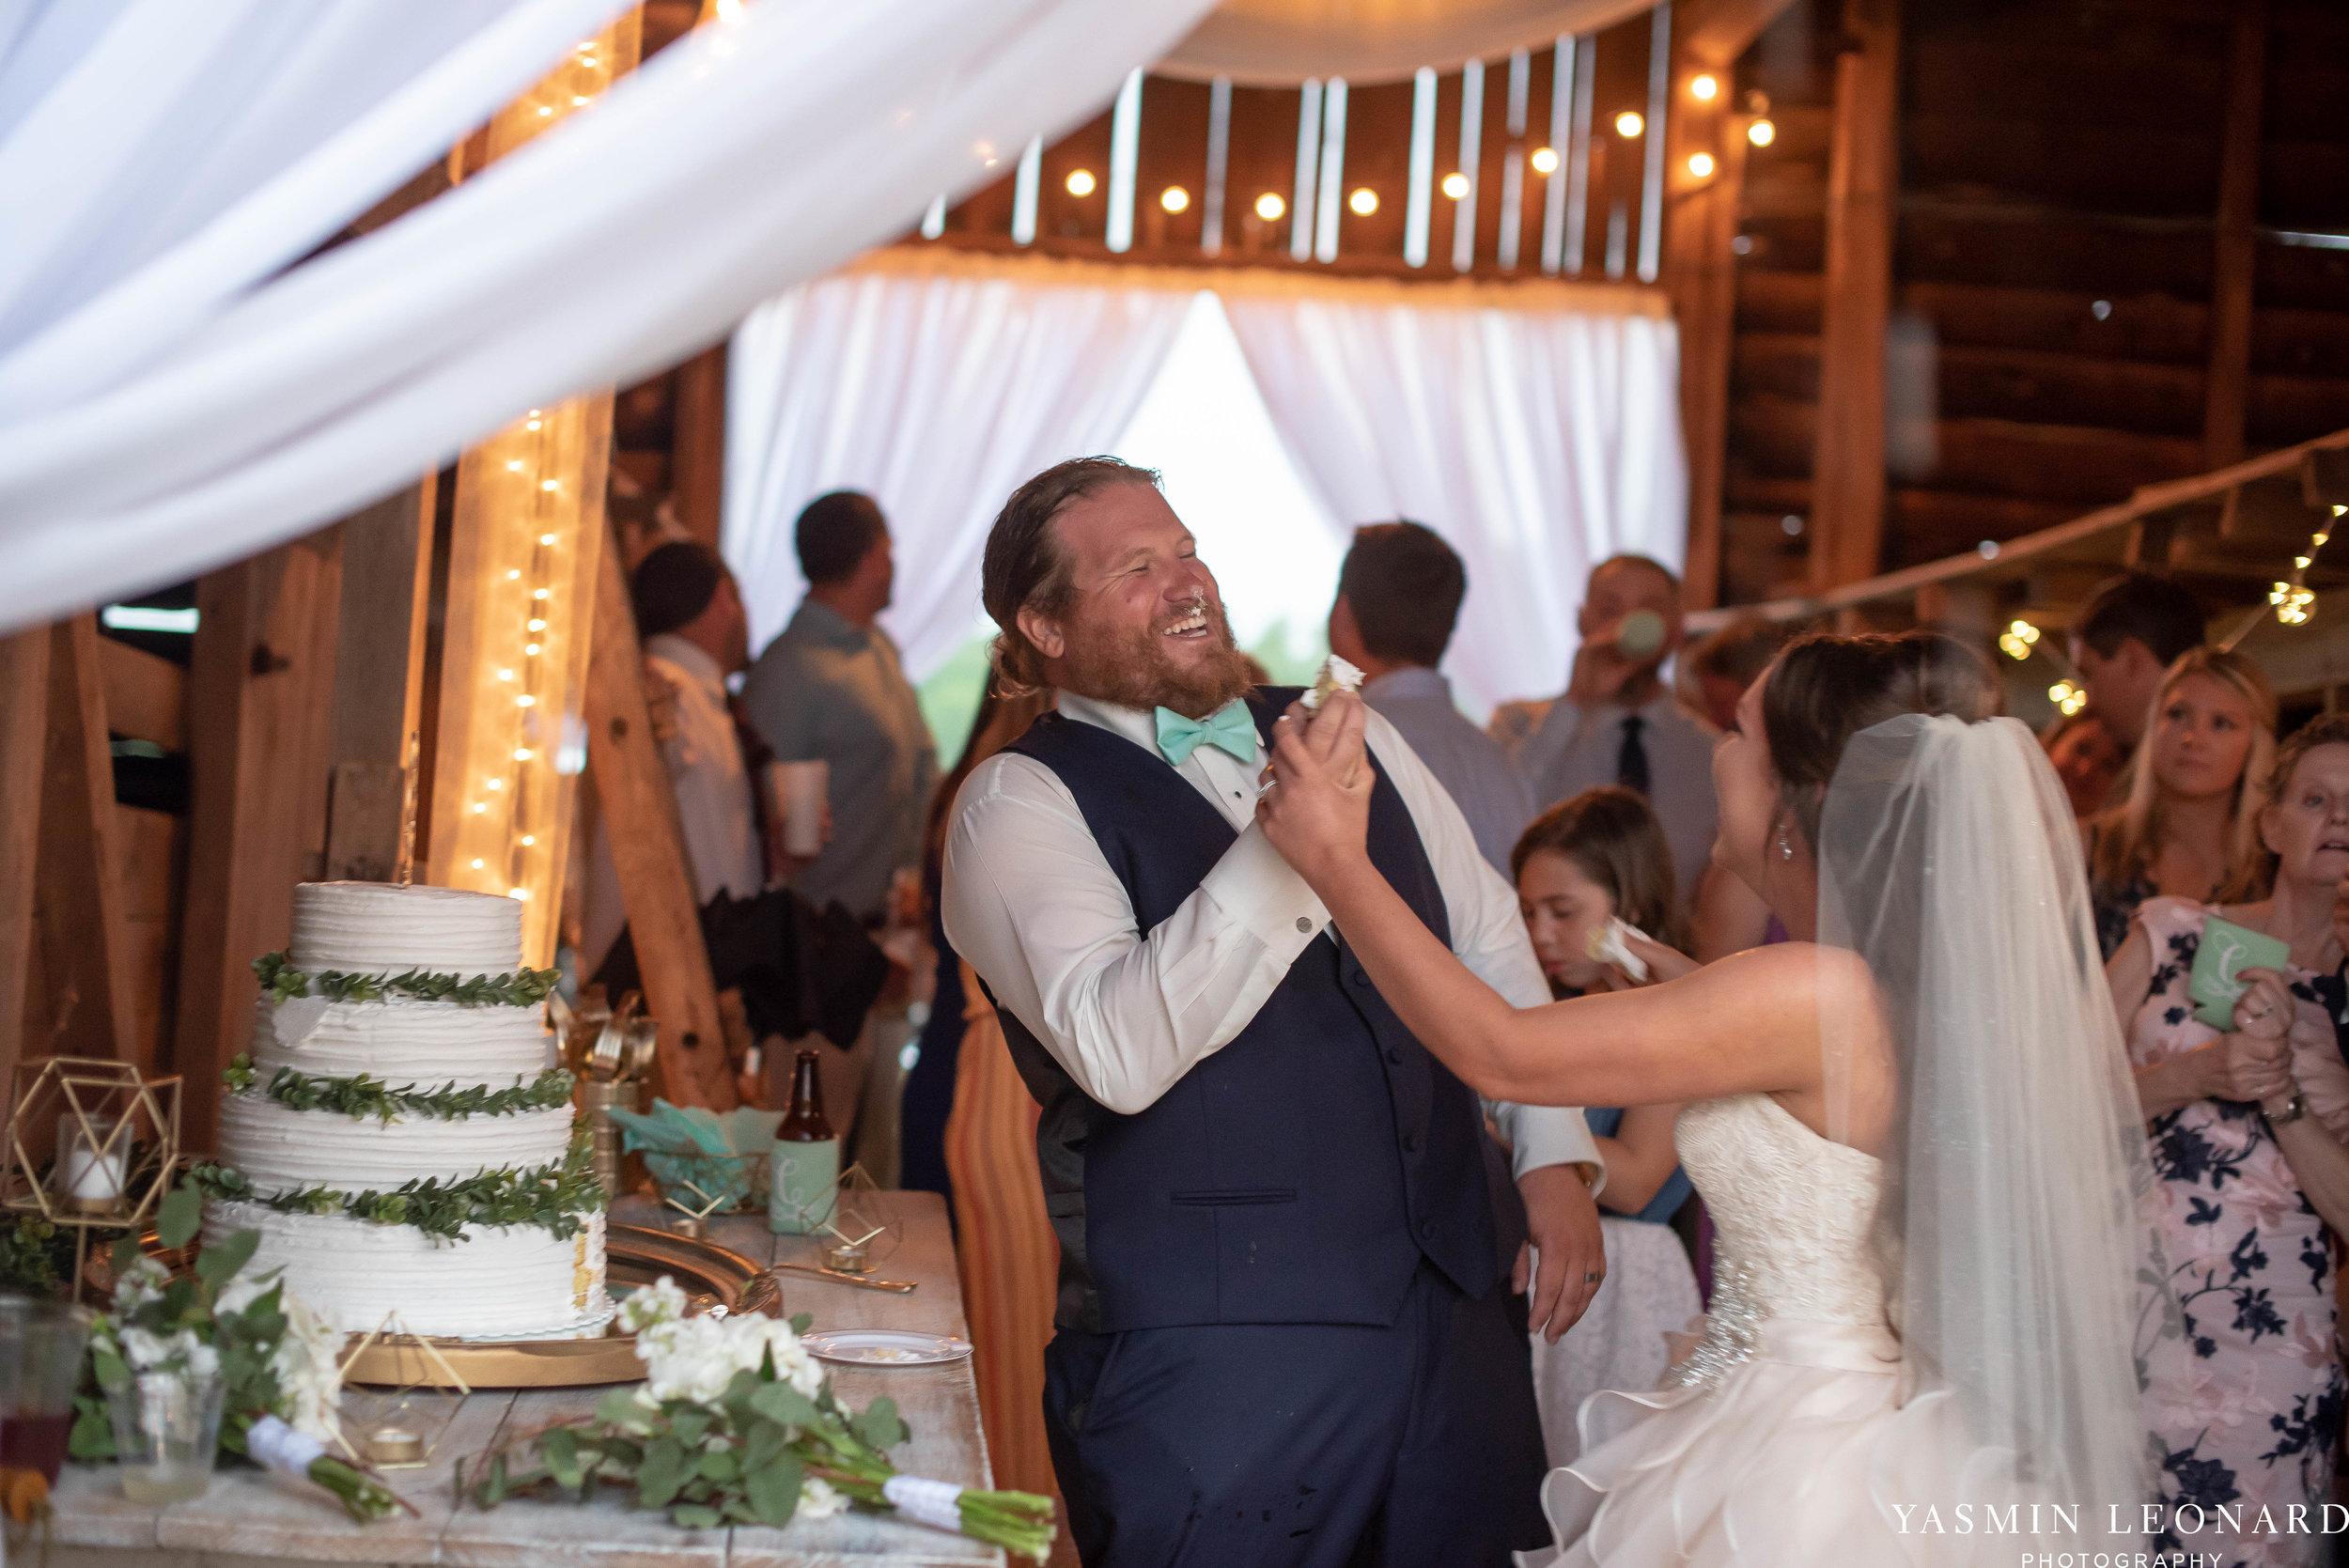 Rain on your wedding day - Rainy Wedding - Plan B for Rain - What to do if it rains on your wedding day - Wedding Inspiration - Outdoor wedding ideas - Rainy Wedding Pictures - Yasmin Leonard Photography-67.jpg